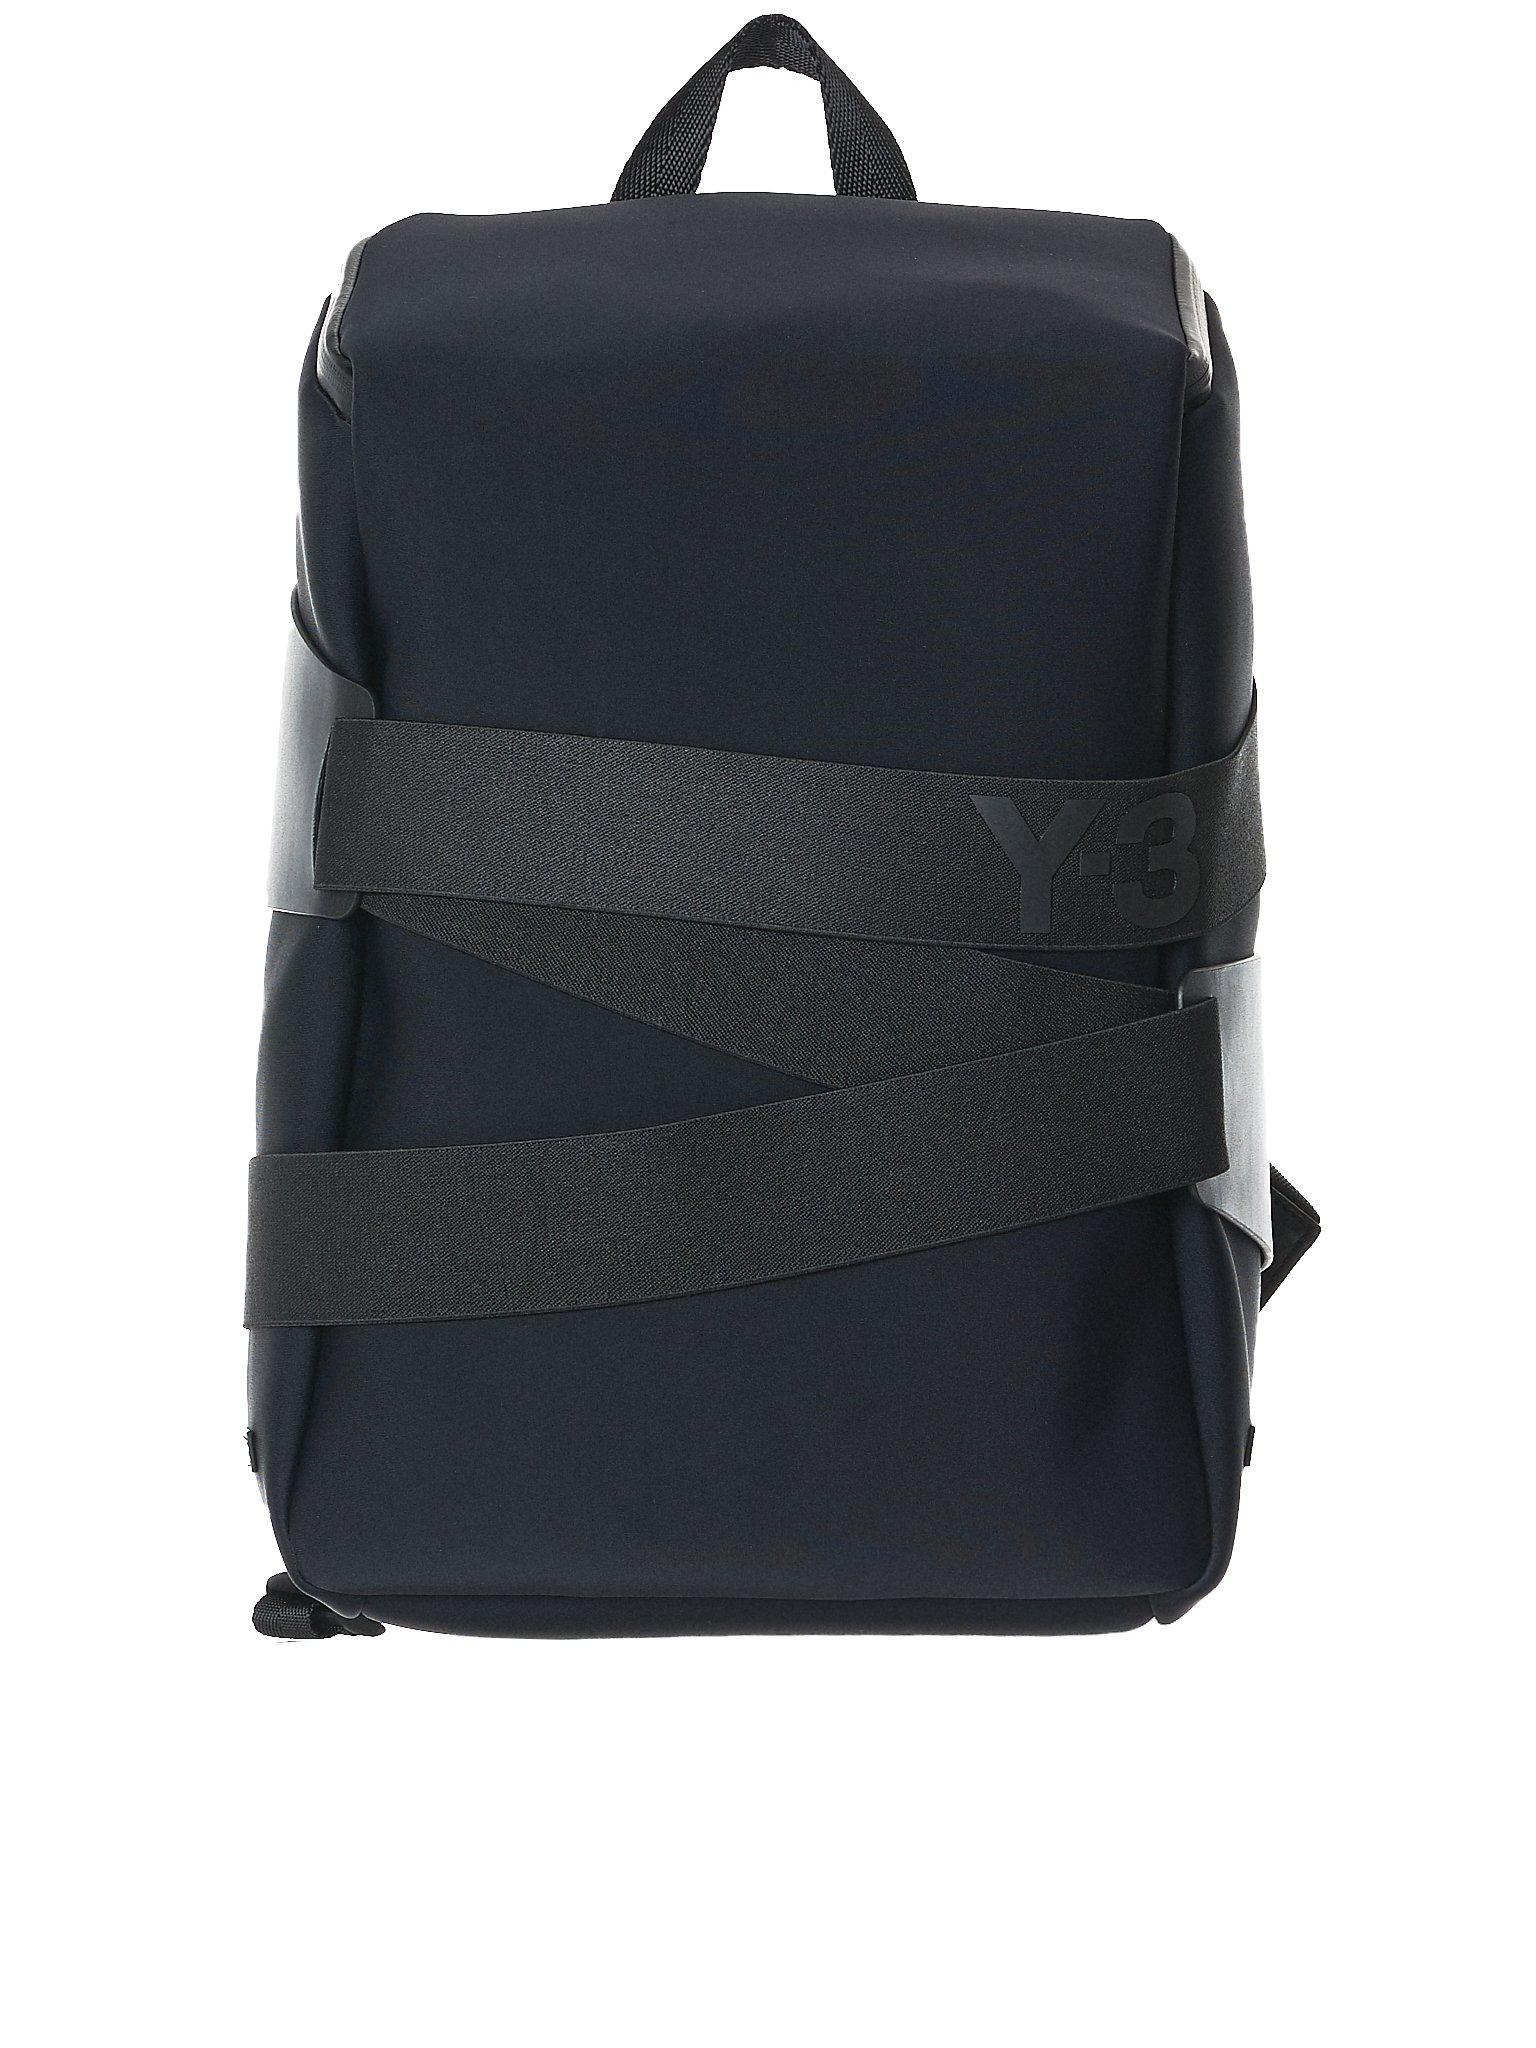 Lyst - Y-3 Strapped Neoprene Backpack in Black for Men 5cf115eacf1f7